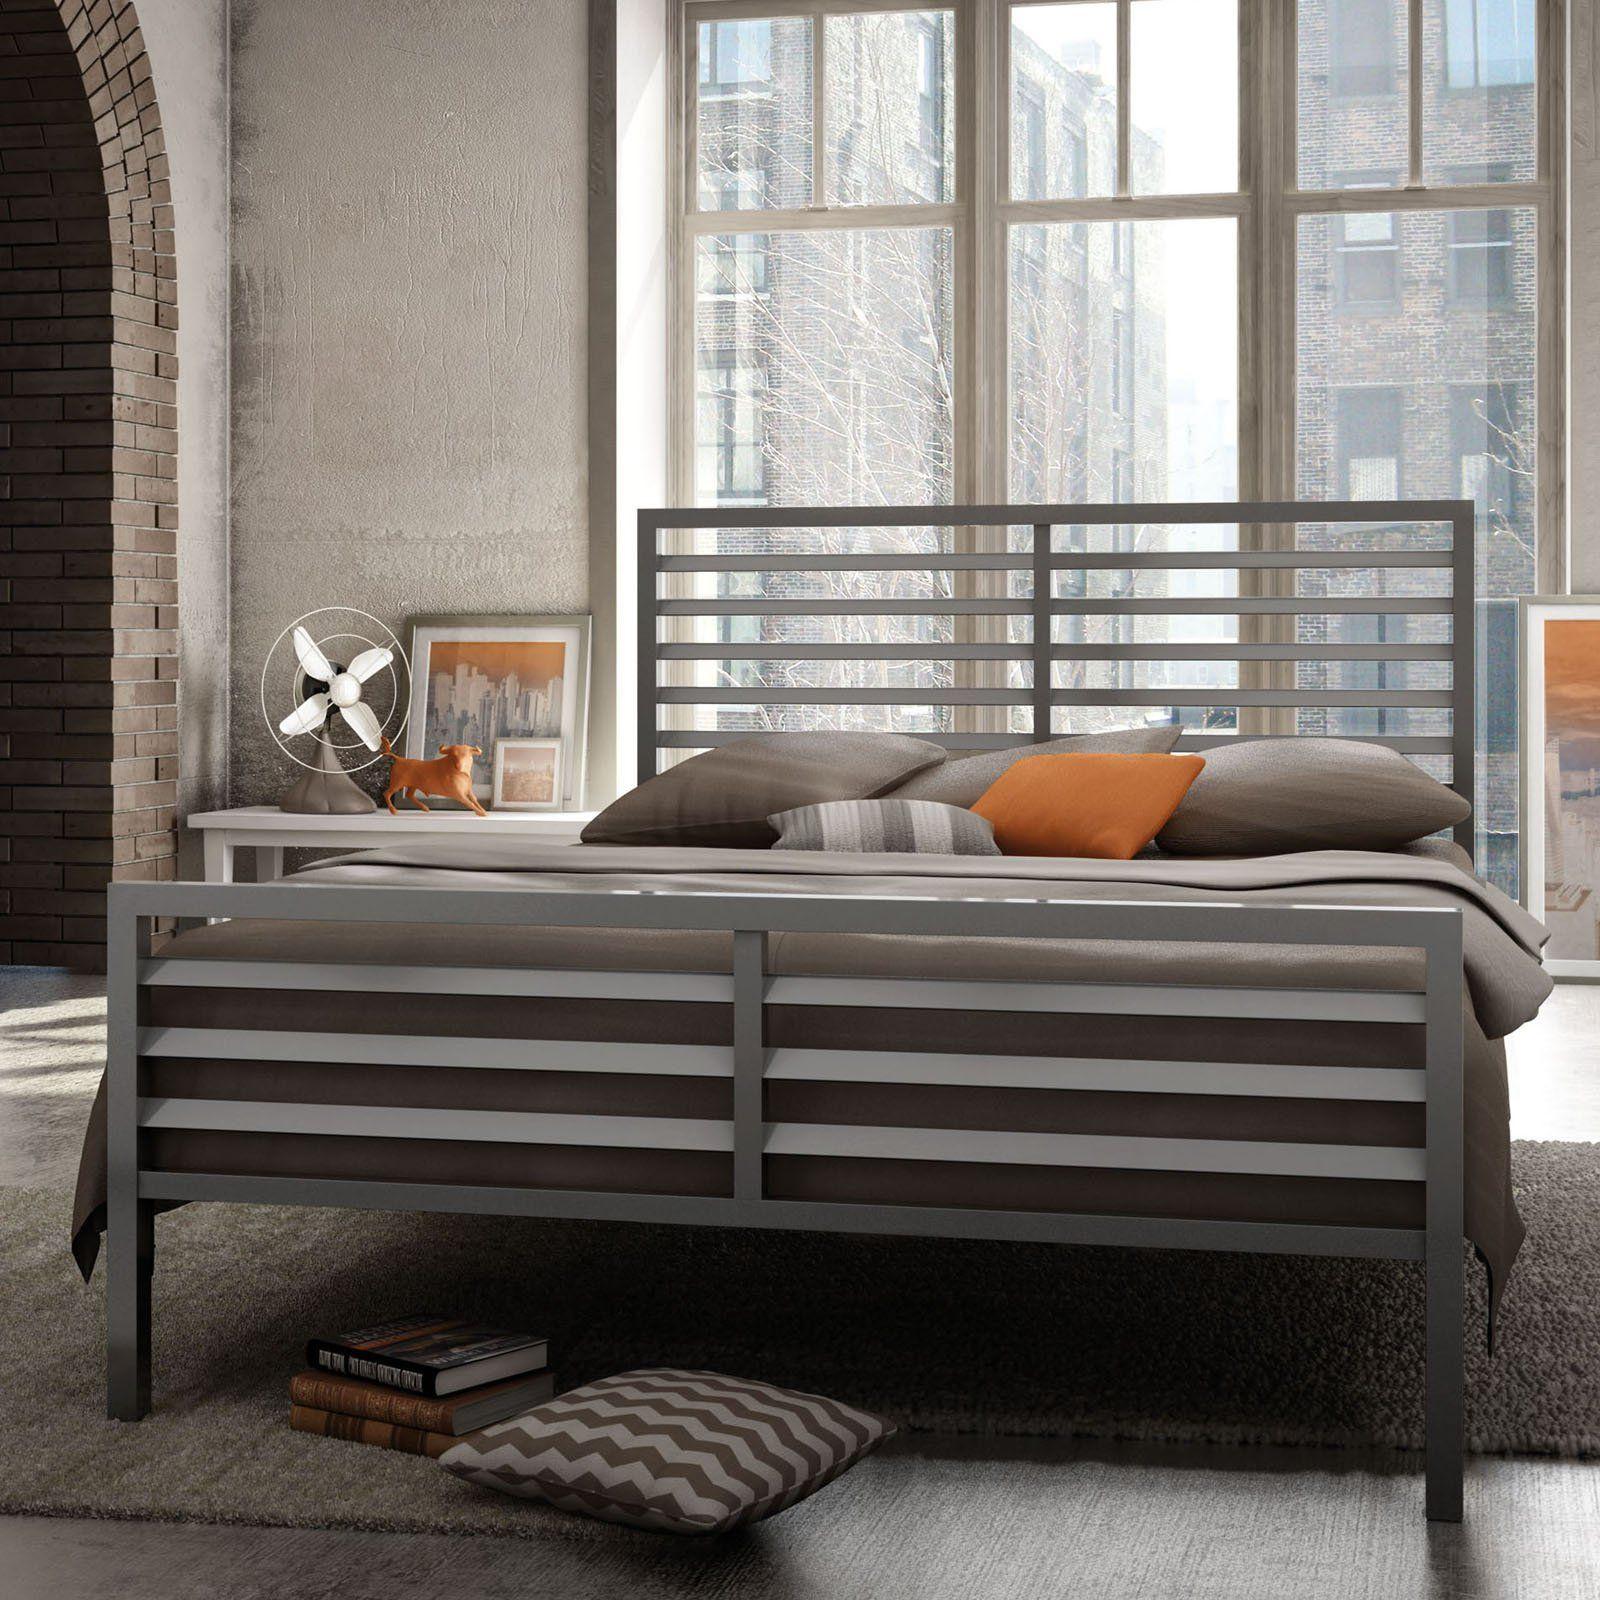 Amisco Theodore Metal Bed 9125 Savannah Metal Beds Bed Bed Frame